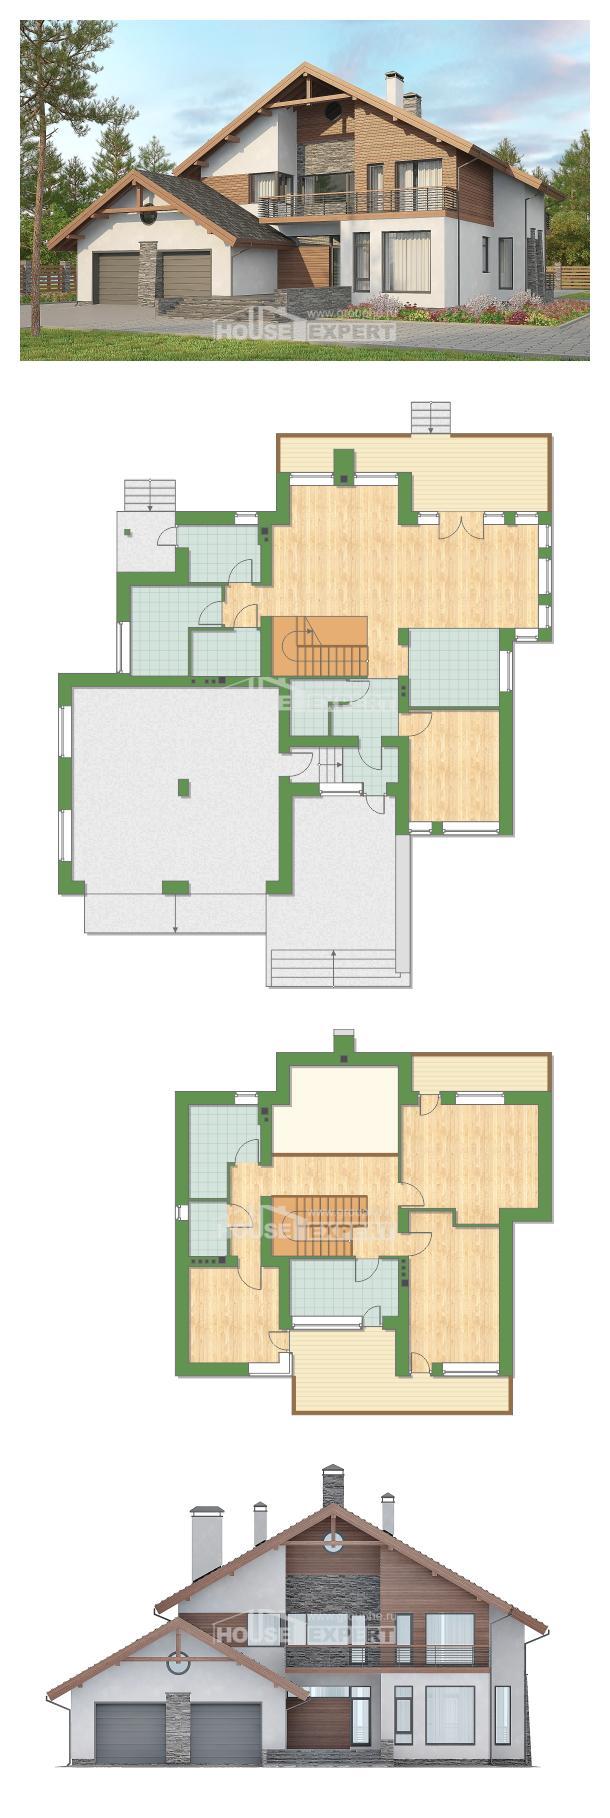 Проект дома 270-003-Л   House Expert